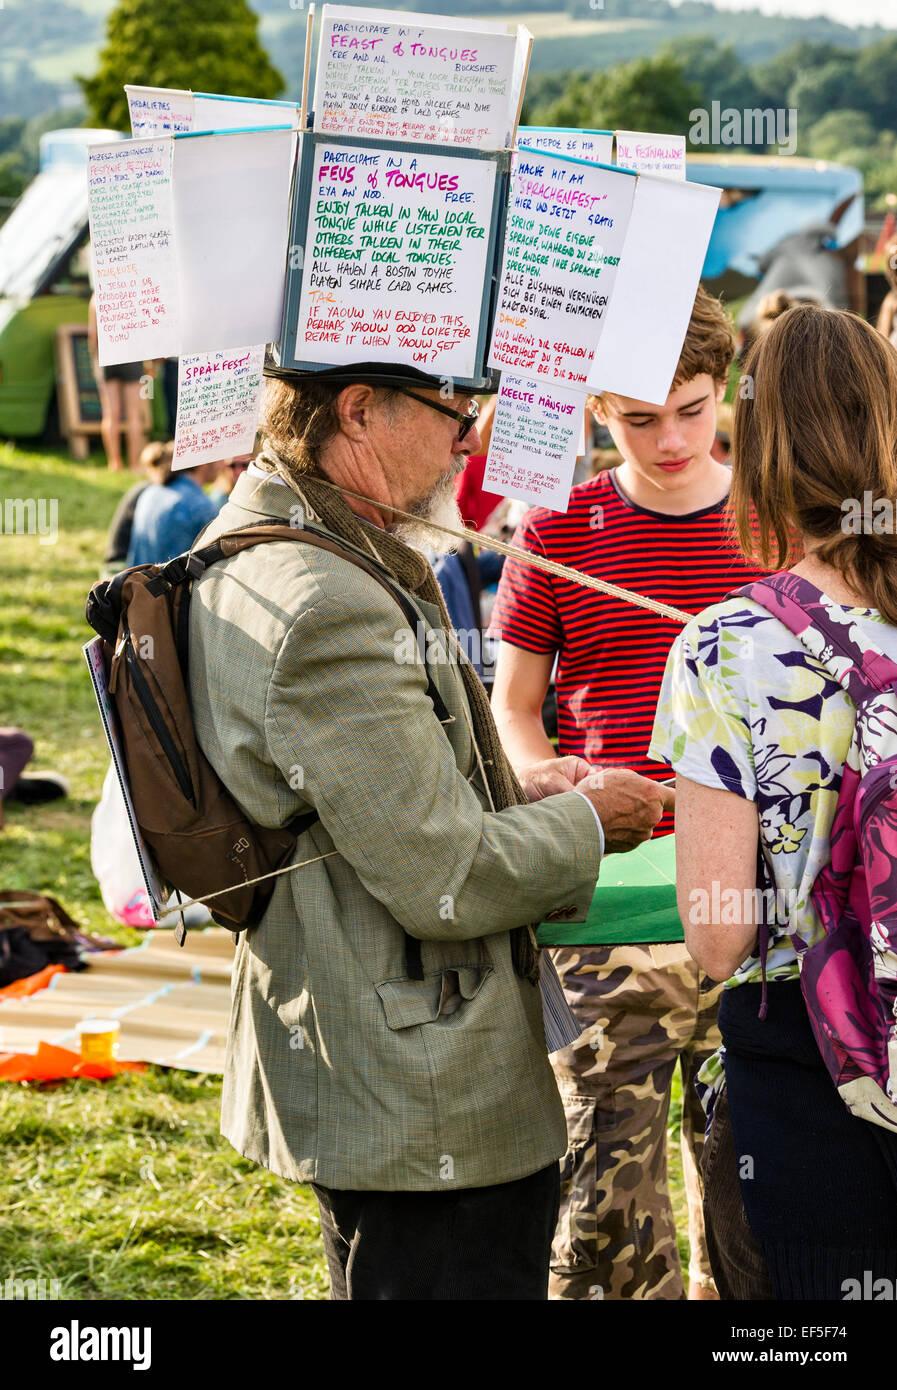 Un artista en el Festival de Música de ovejas Presteigne, Powys, Reino Unido Imagen De Stock